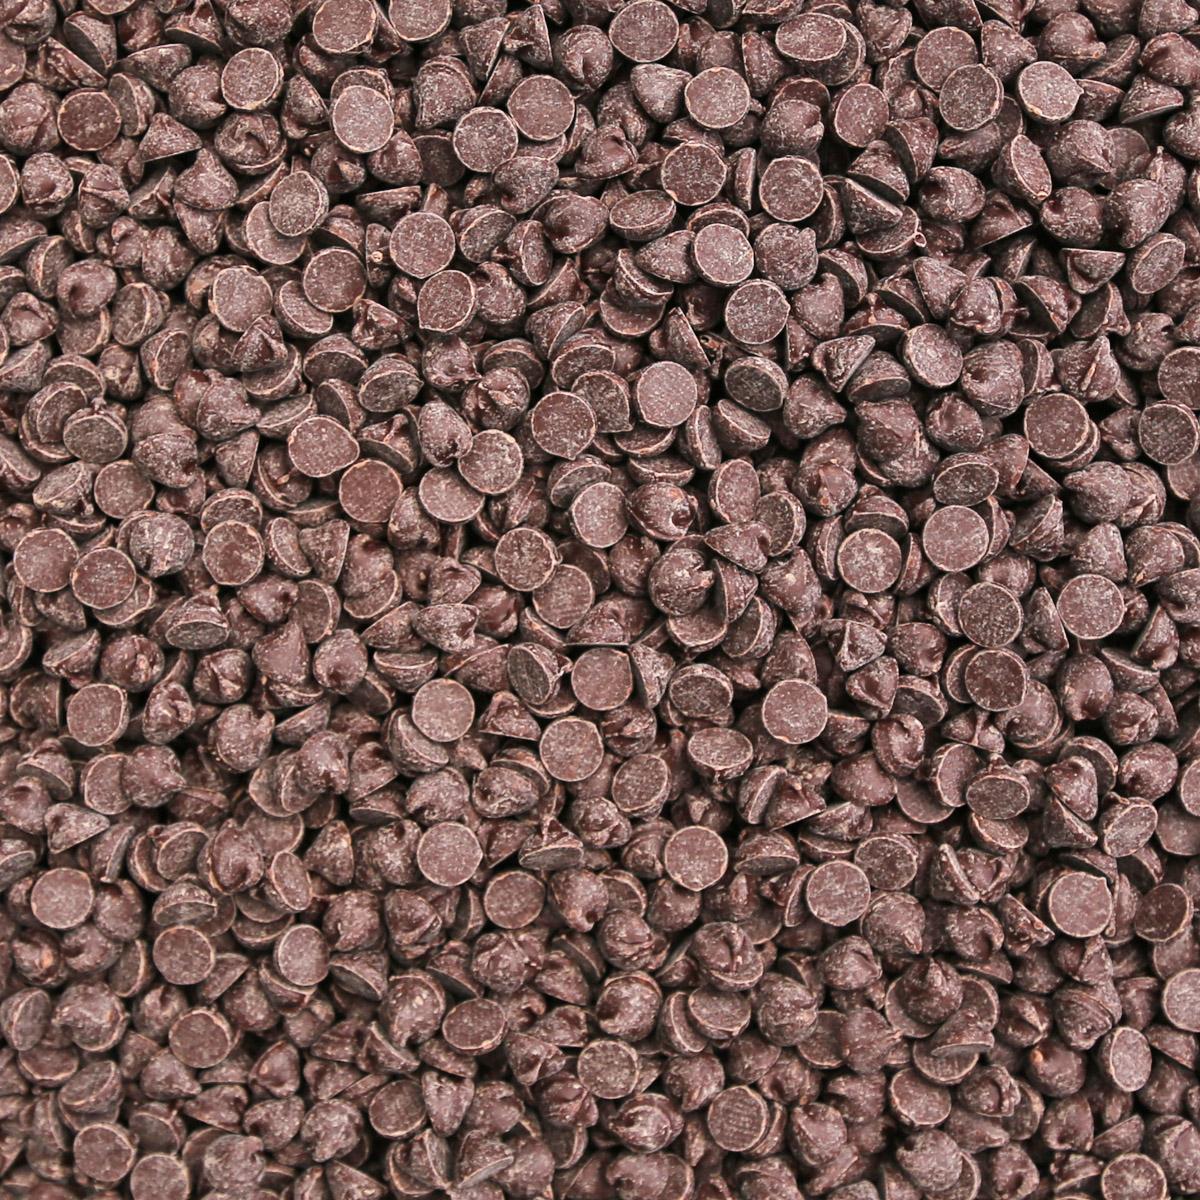 ORGANIC CHOCOLATE CHIPS, 1000CT, 45% SEMISWEET